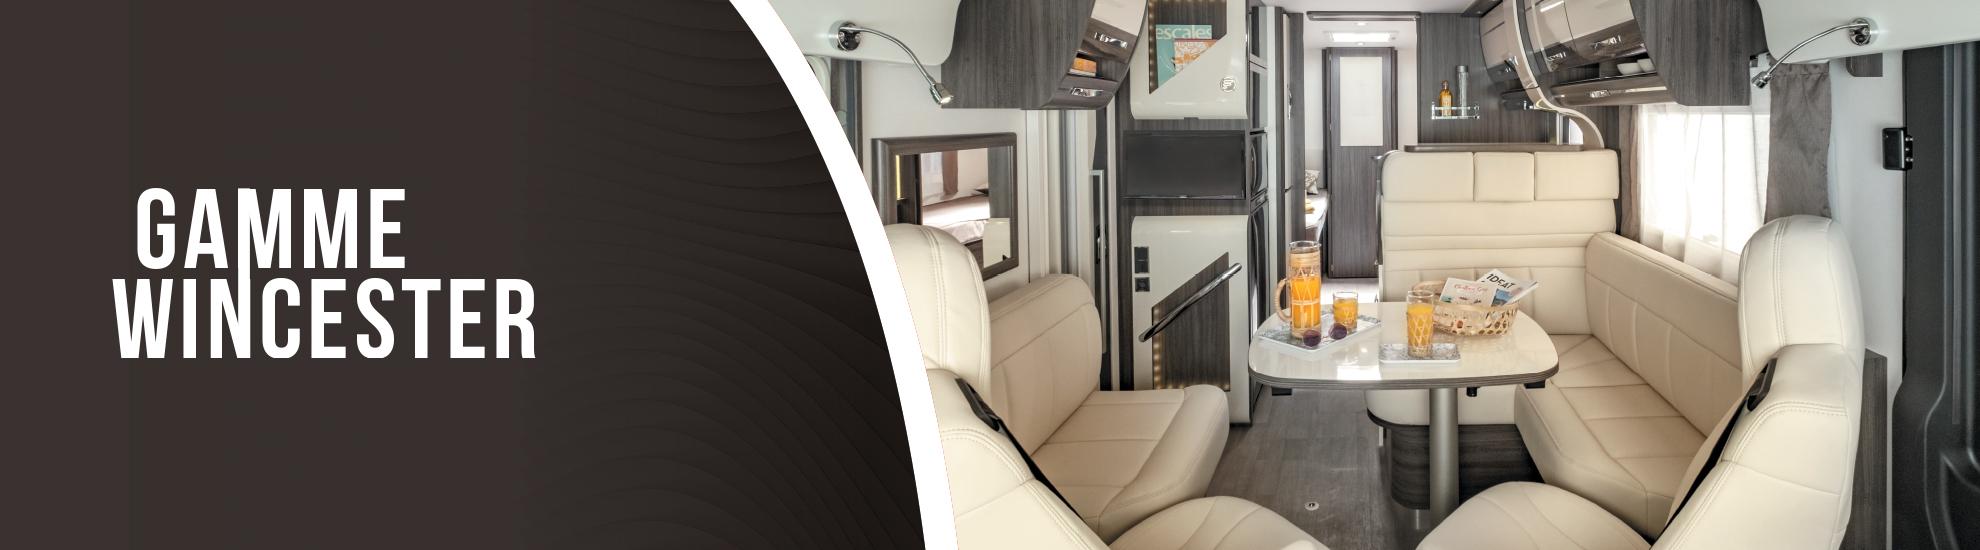 camping-car-Florium-gamme-wincester-slide